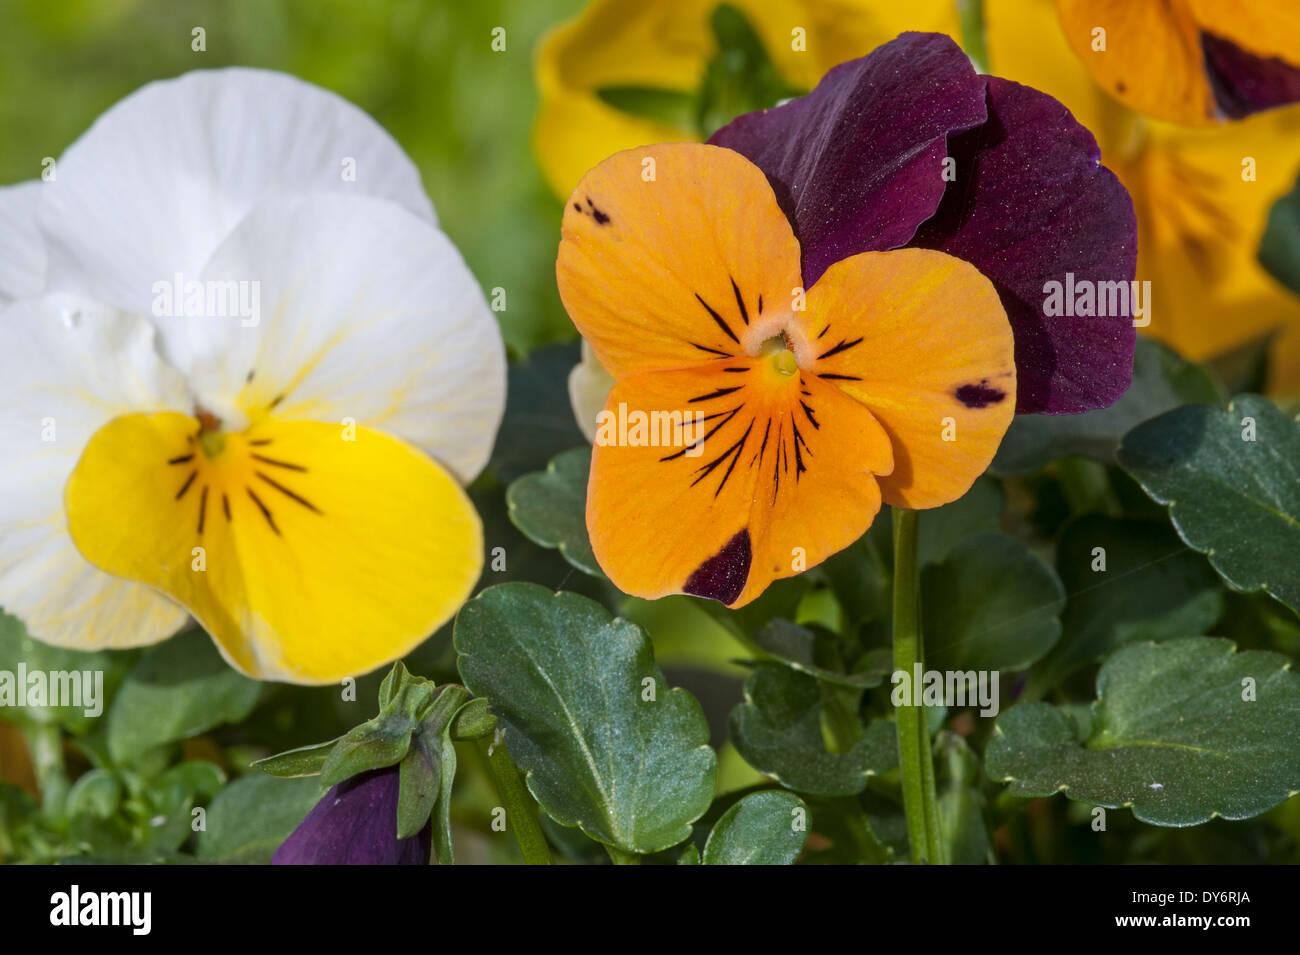 Colourful pansies, Viola cultivars in flower in garden in spring - Stock Image